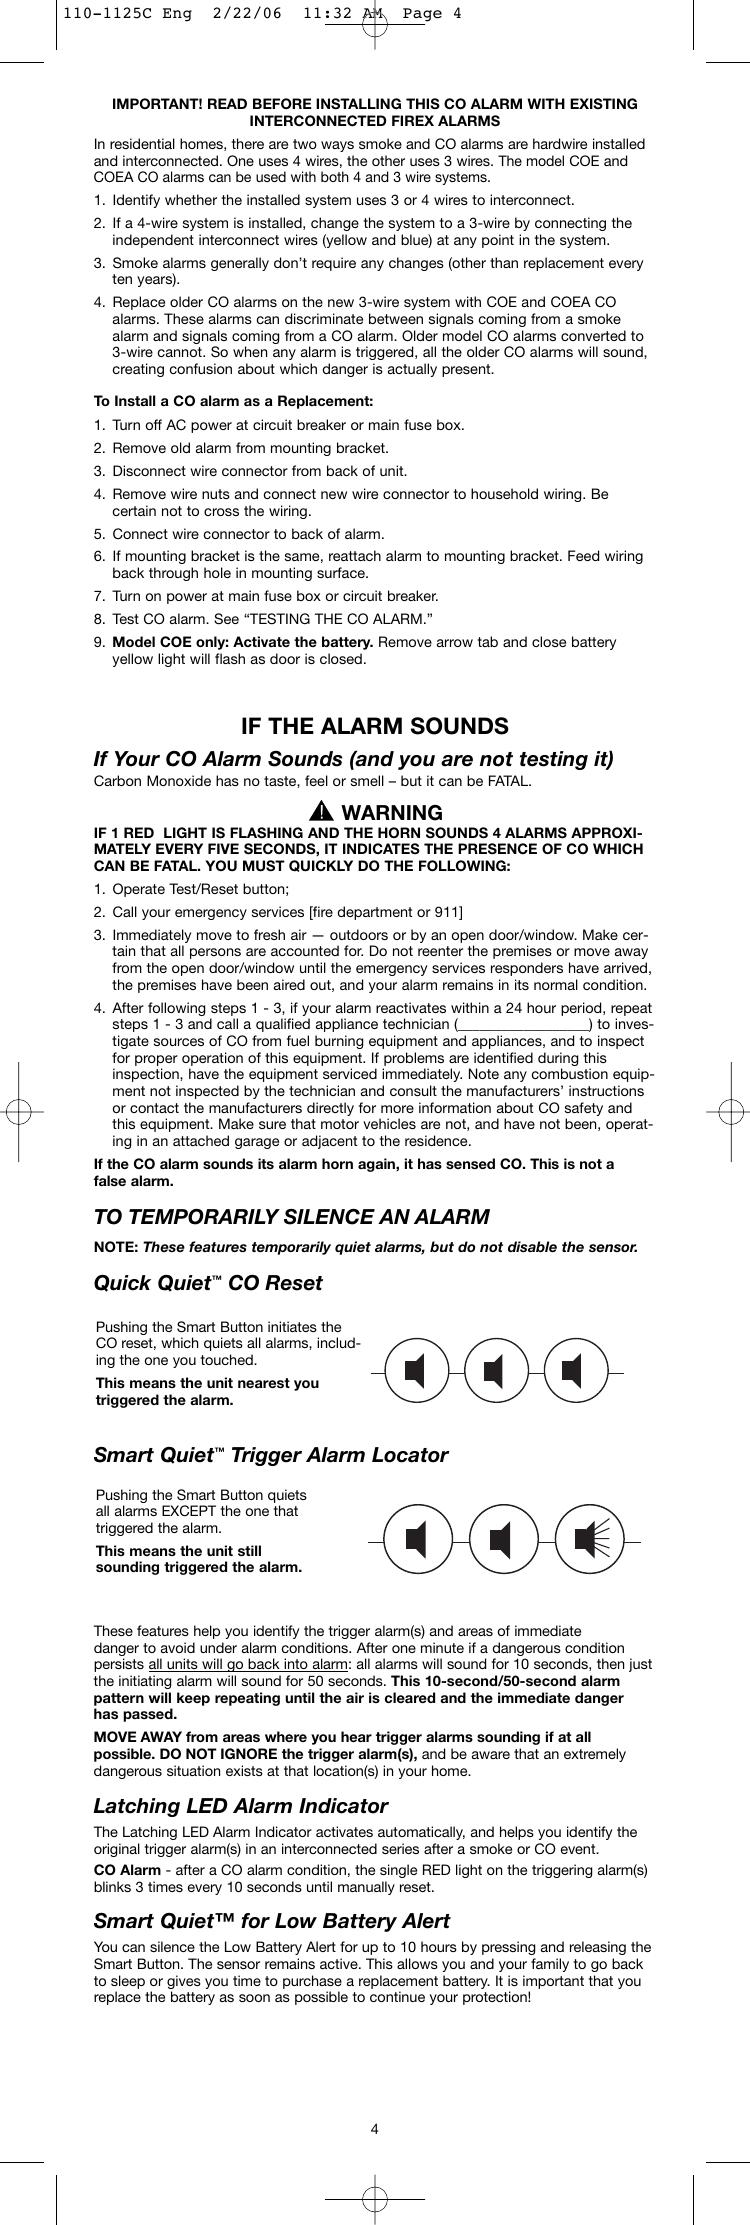 Firex Series 10000 Users Manual 110 1125C Eng